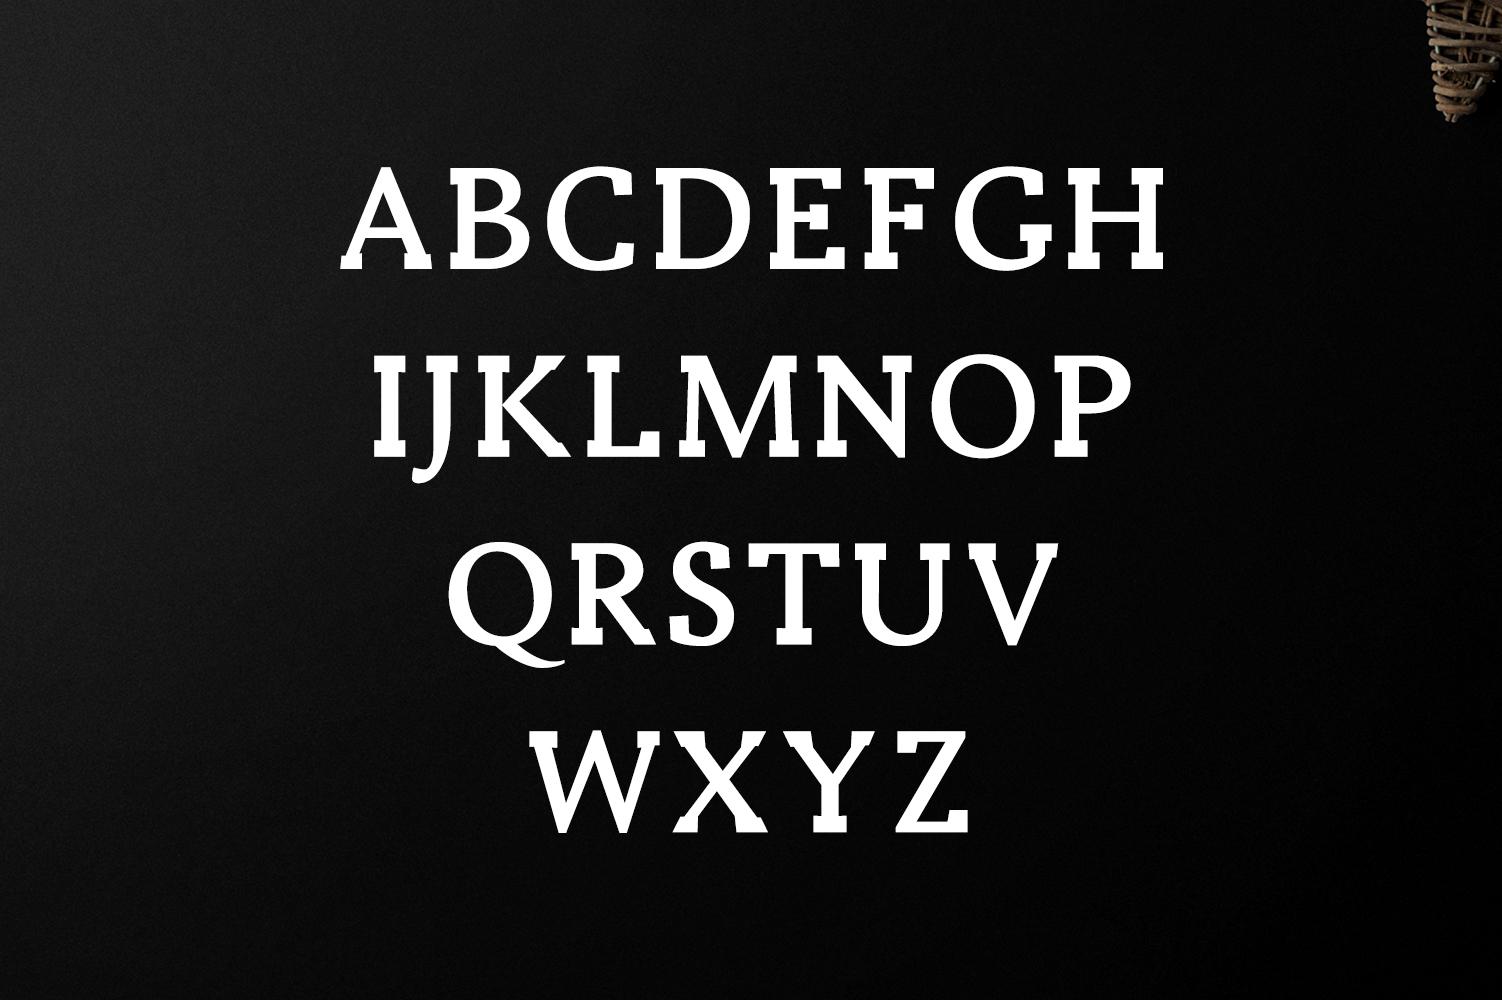 Ireene Serif 3 Font Family Pack example image 6